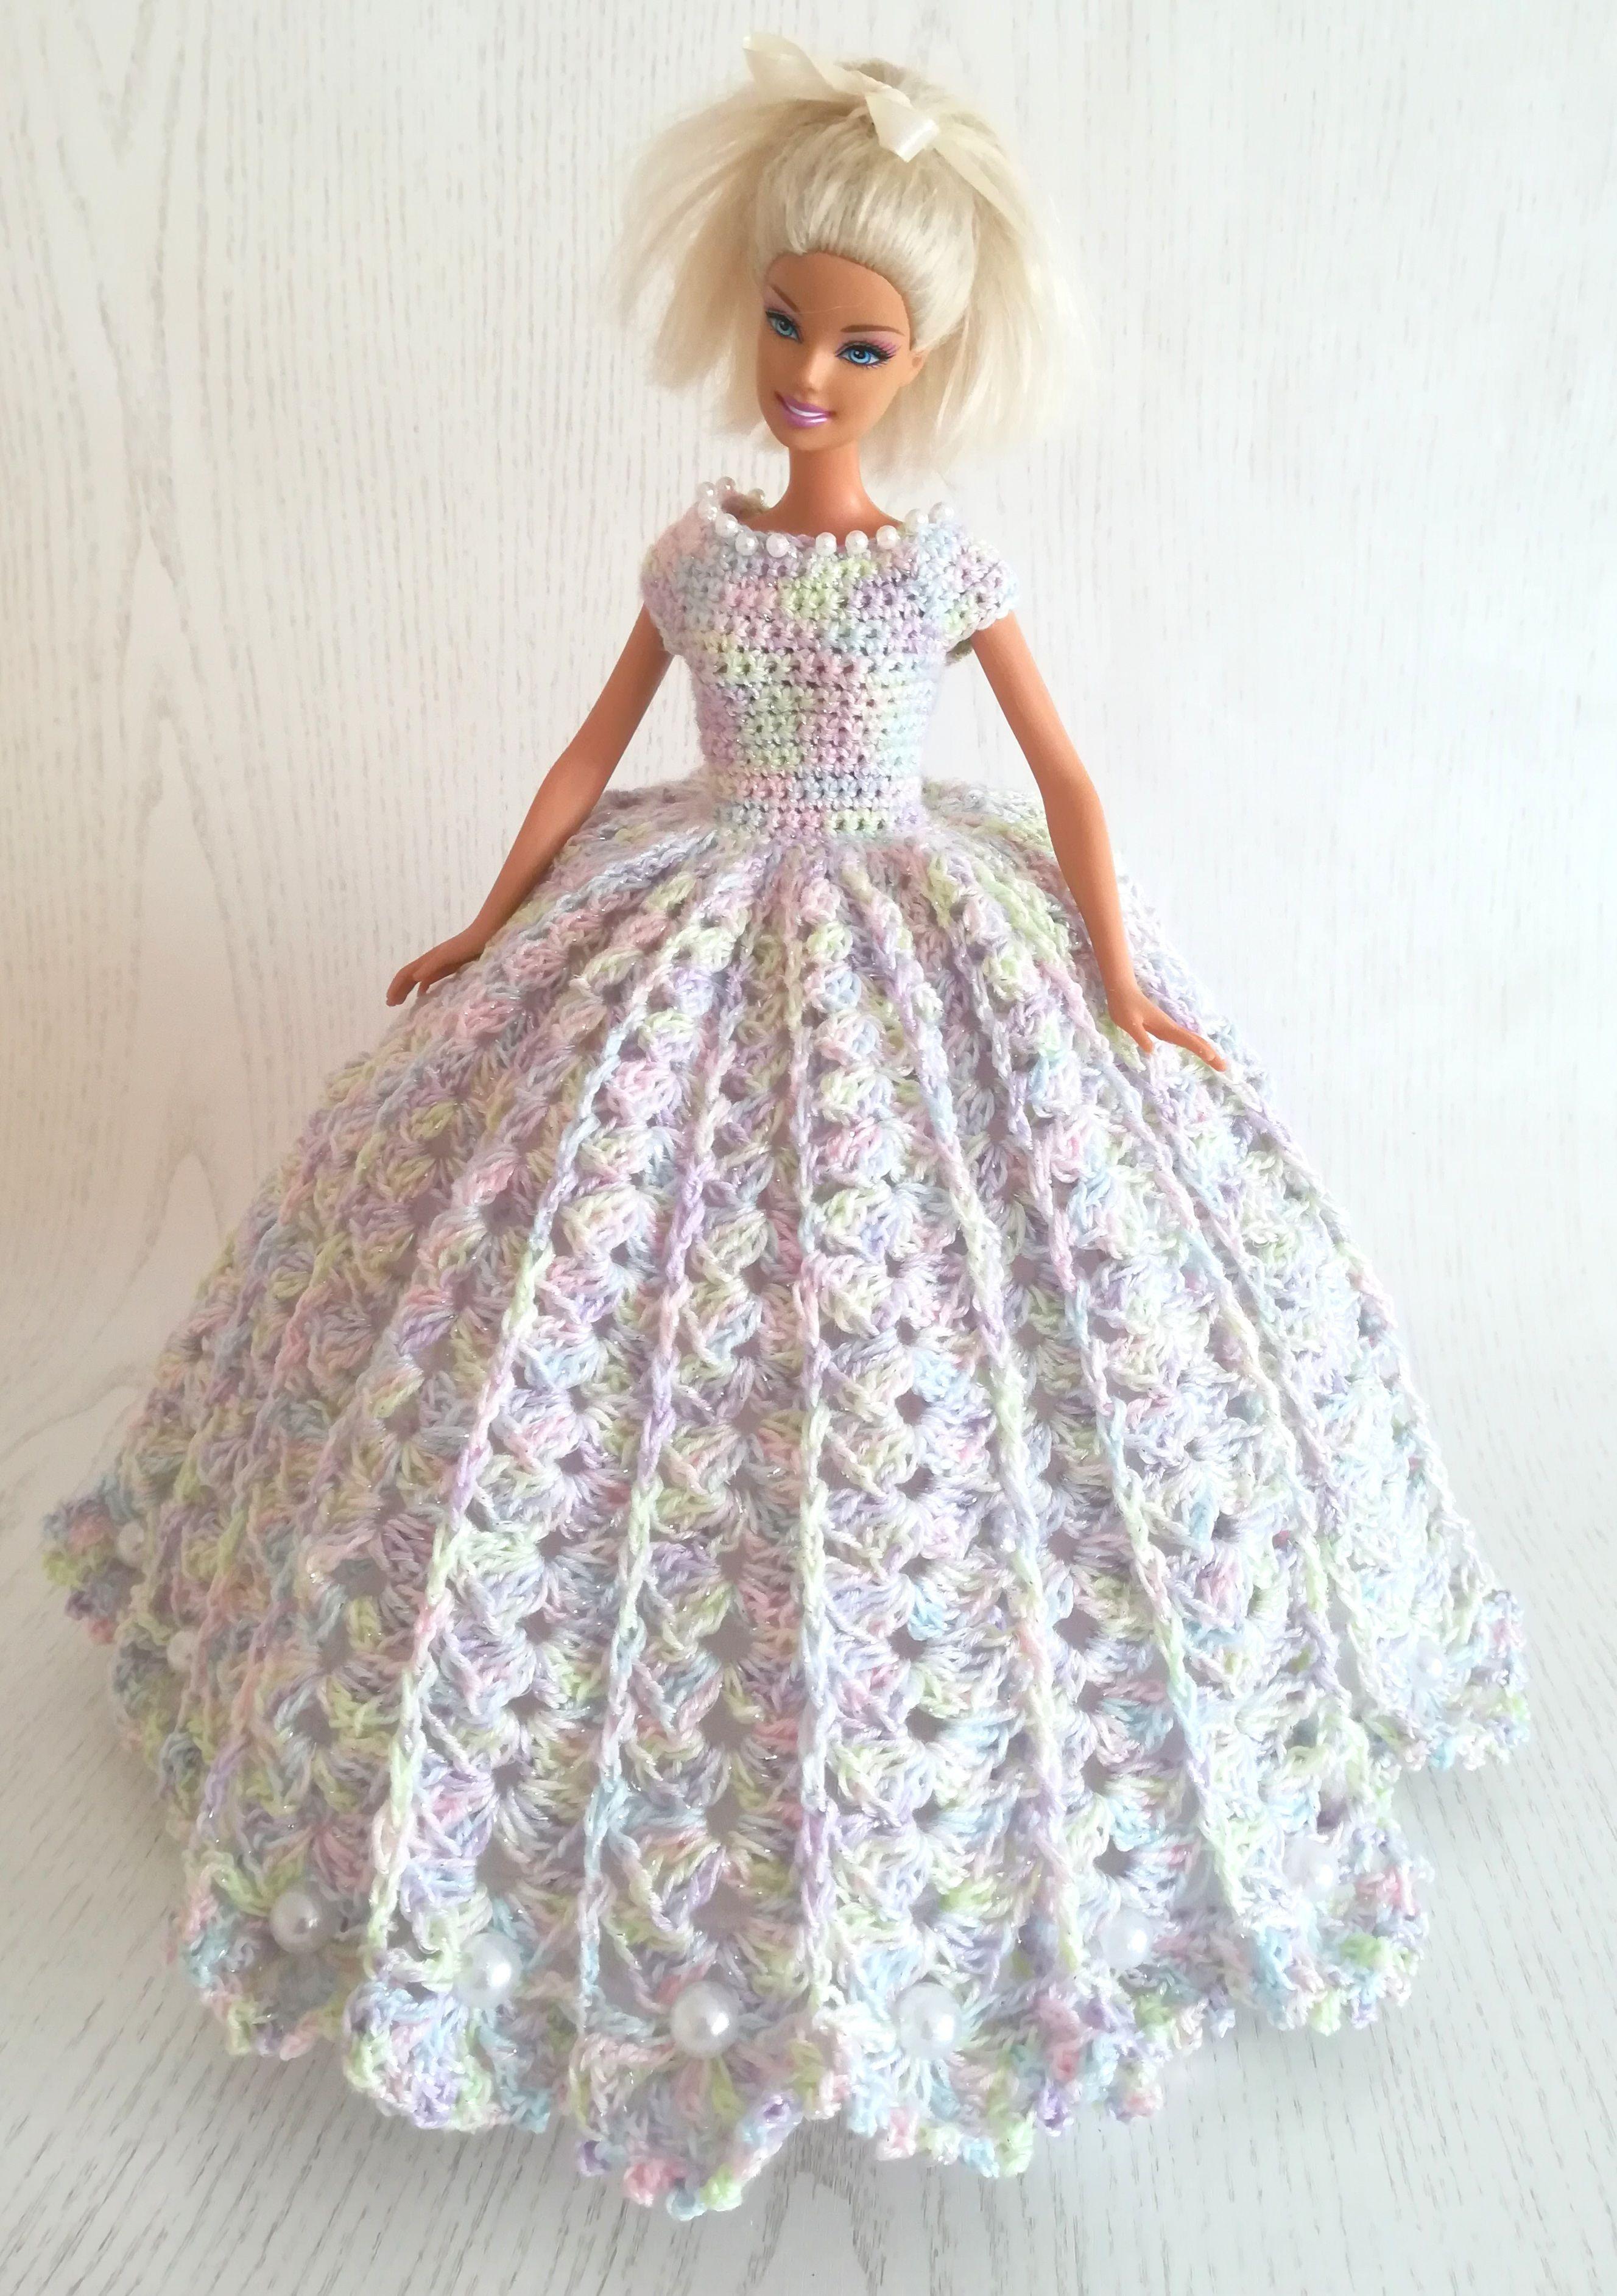 Dress for Barbie doll crochet in 2020 Crochet wedding